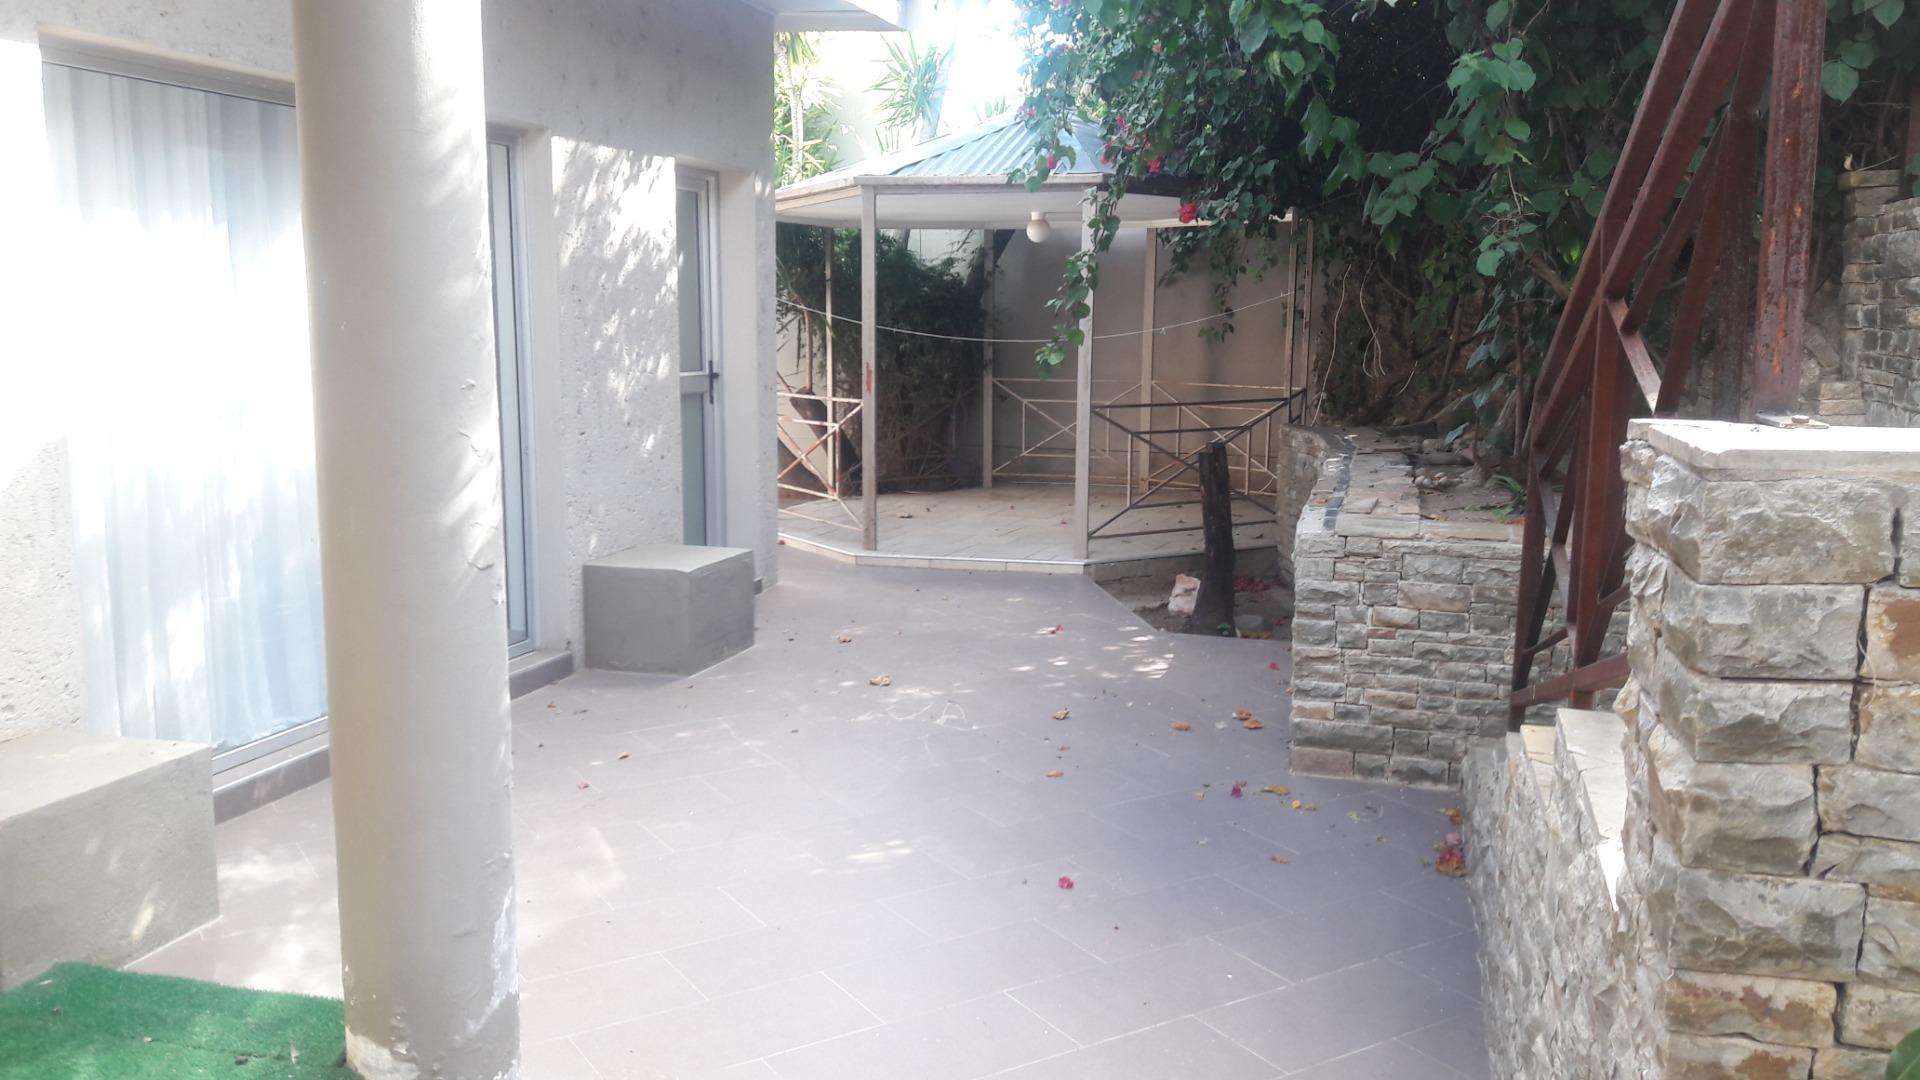 7 Bedroom House For Sale in Klein Windhoek